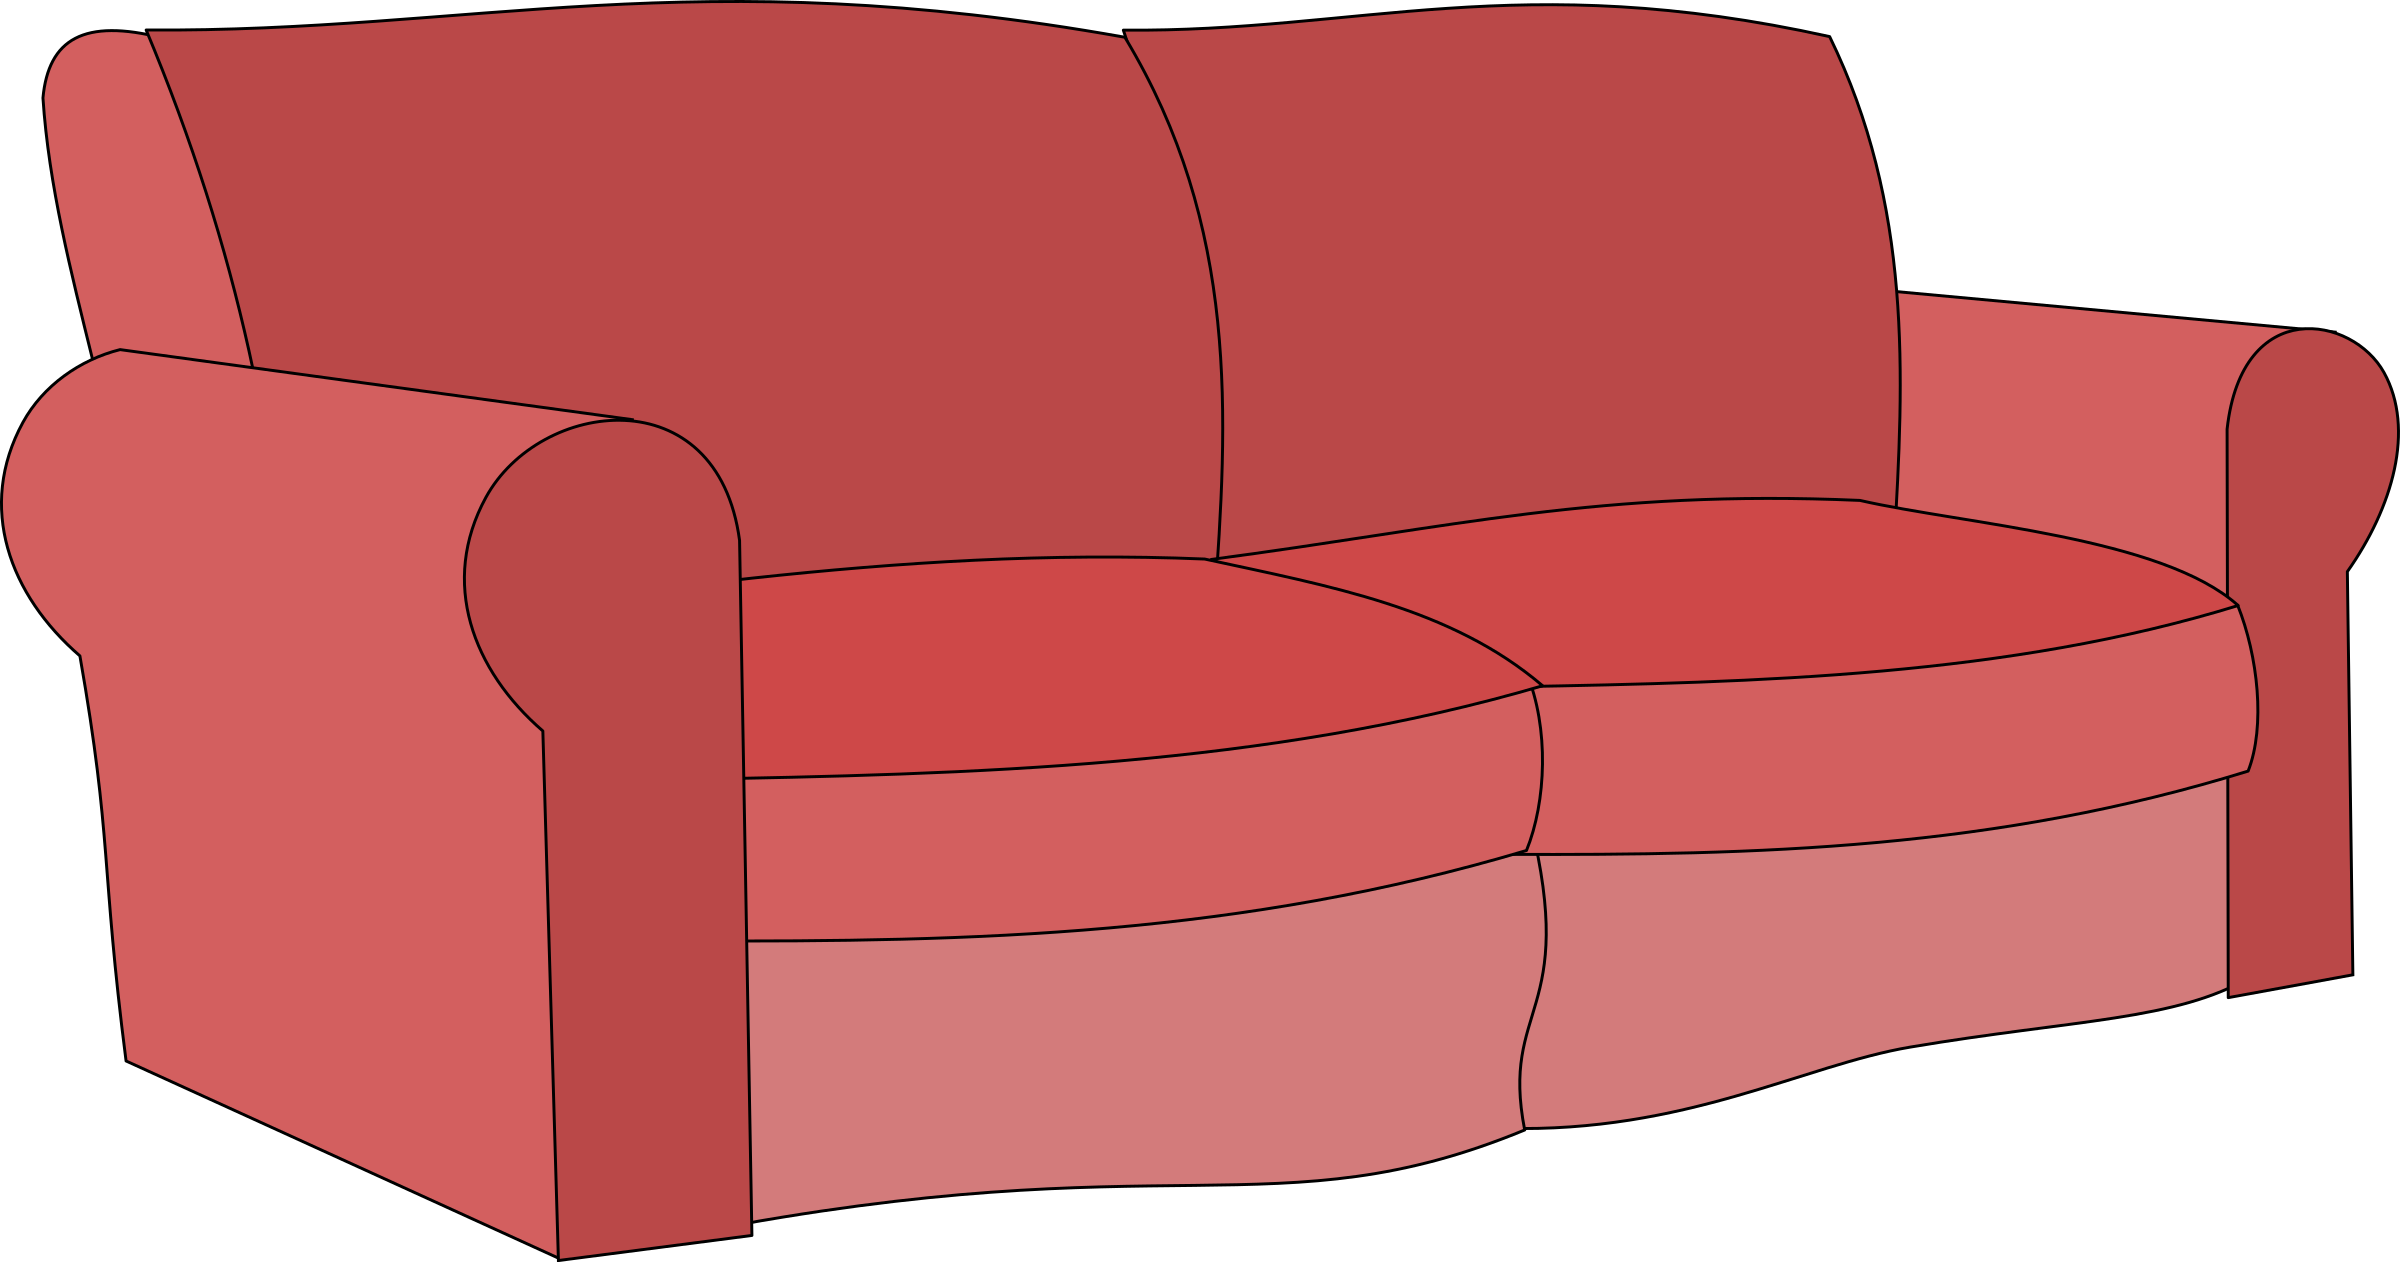 clip art transparent stock Couch Clipart clip art